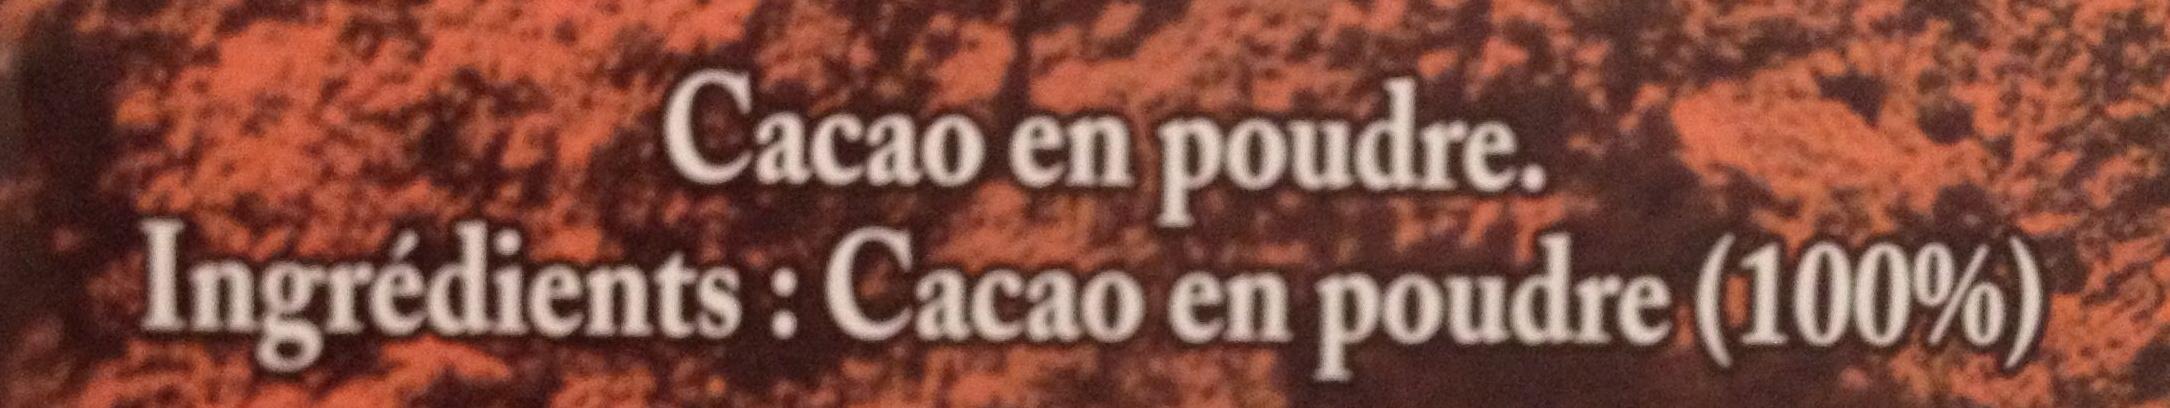 100 % cacao - Ingrédients